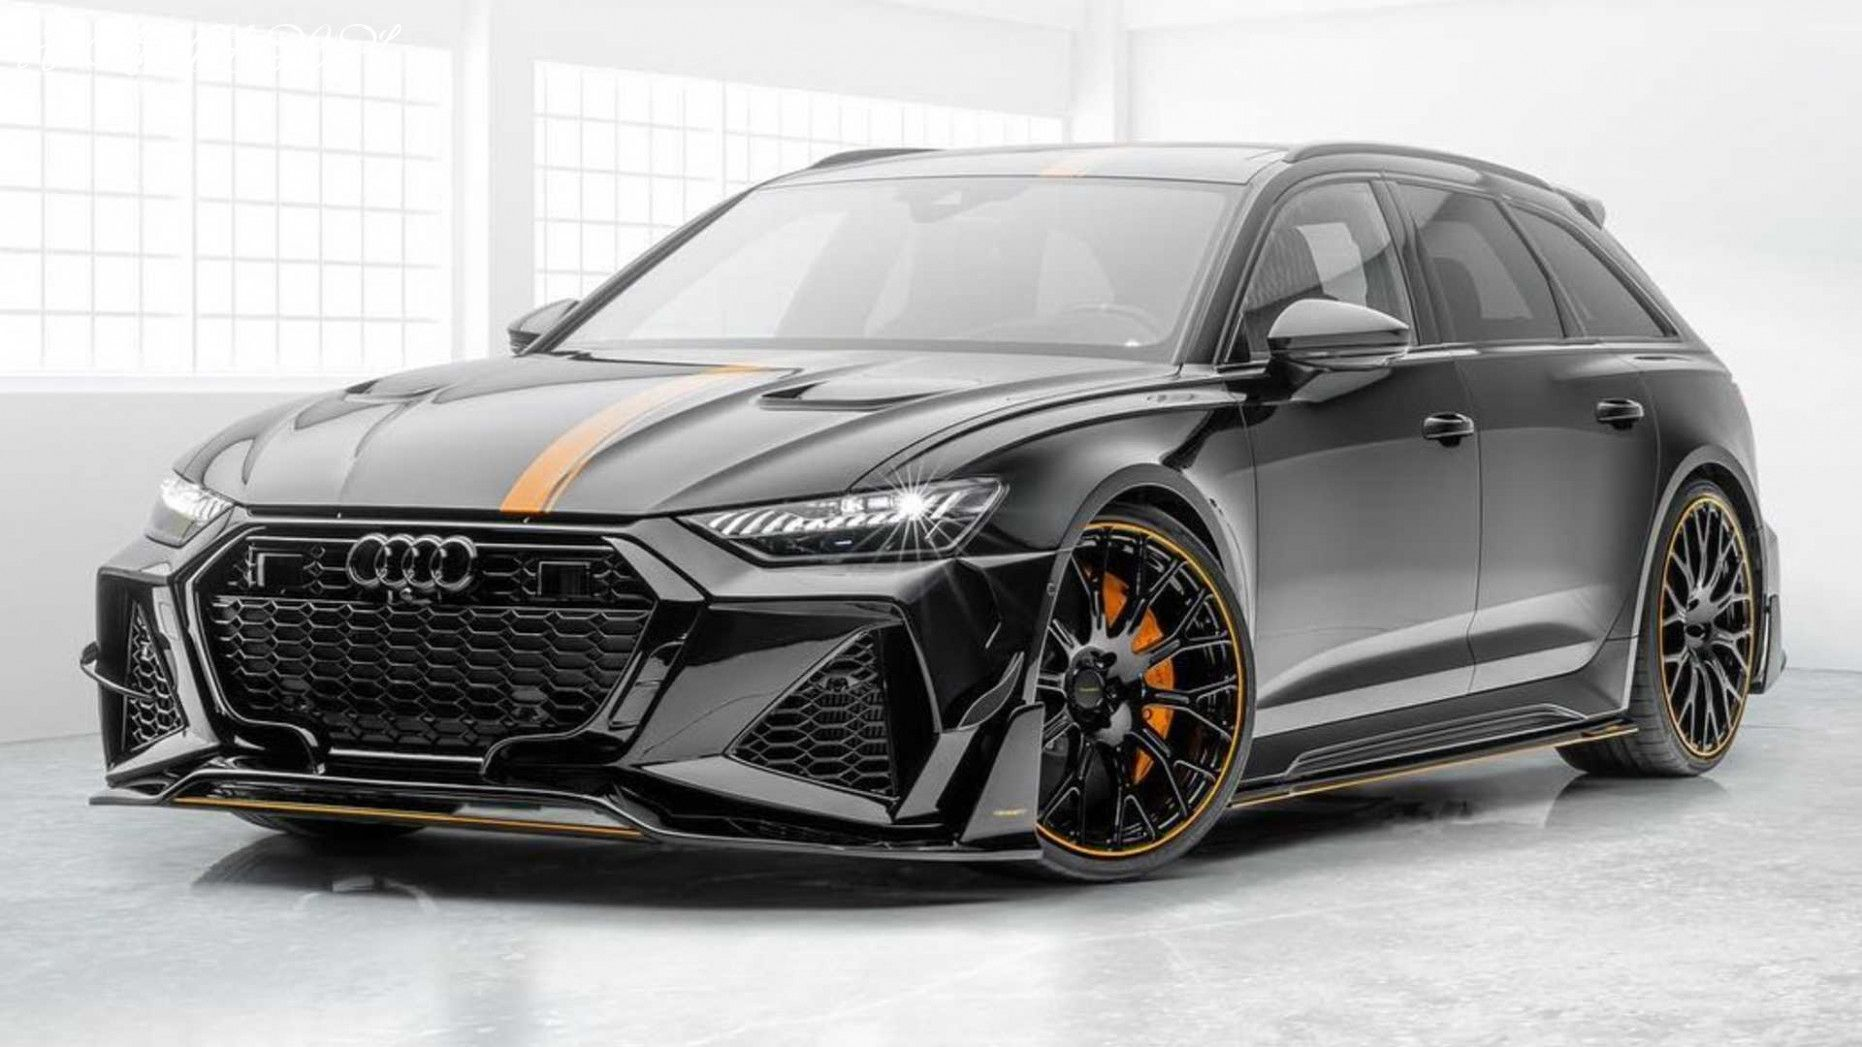 Preis und Bewertung Xe Audi Q7 2021